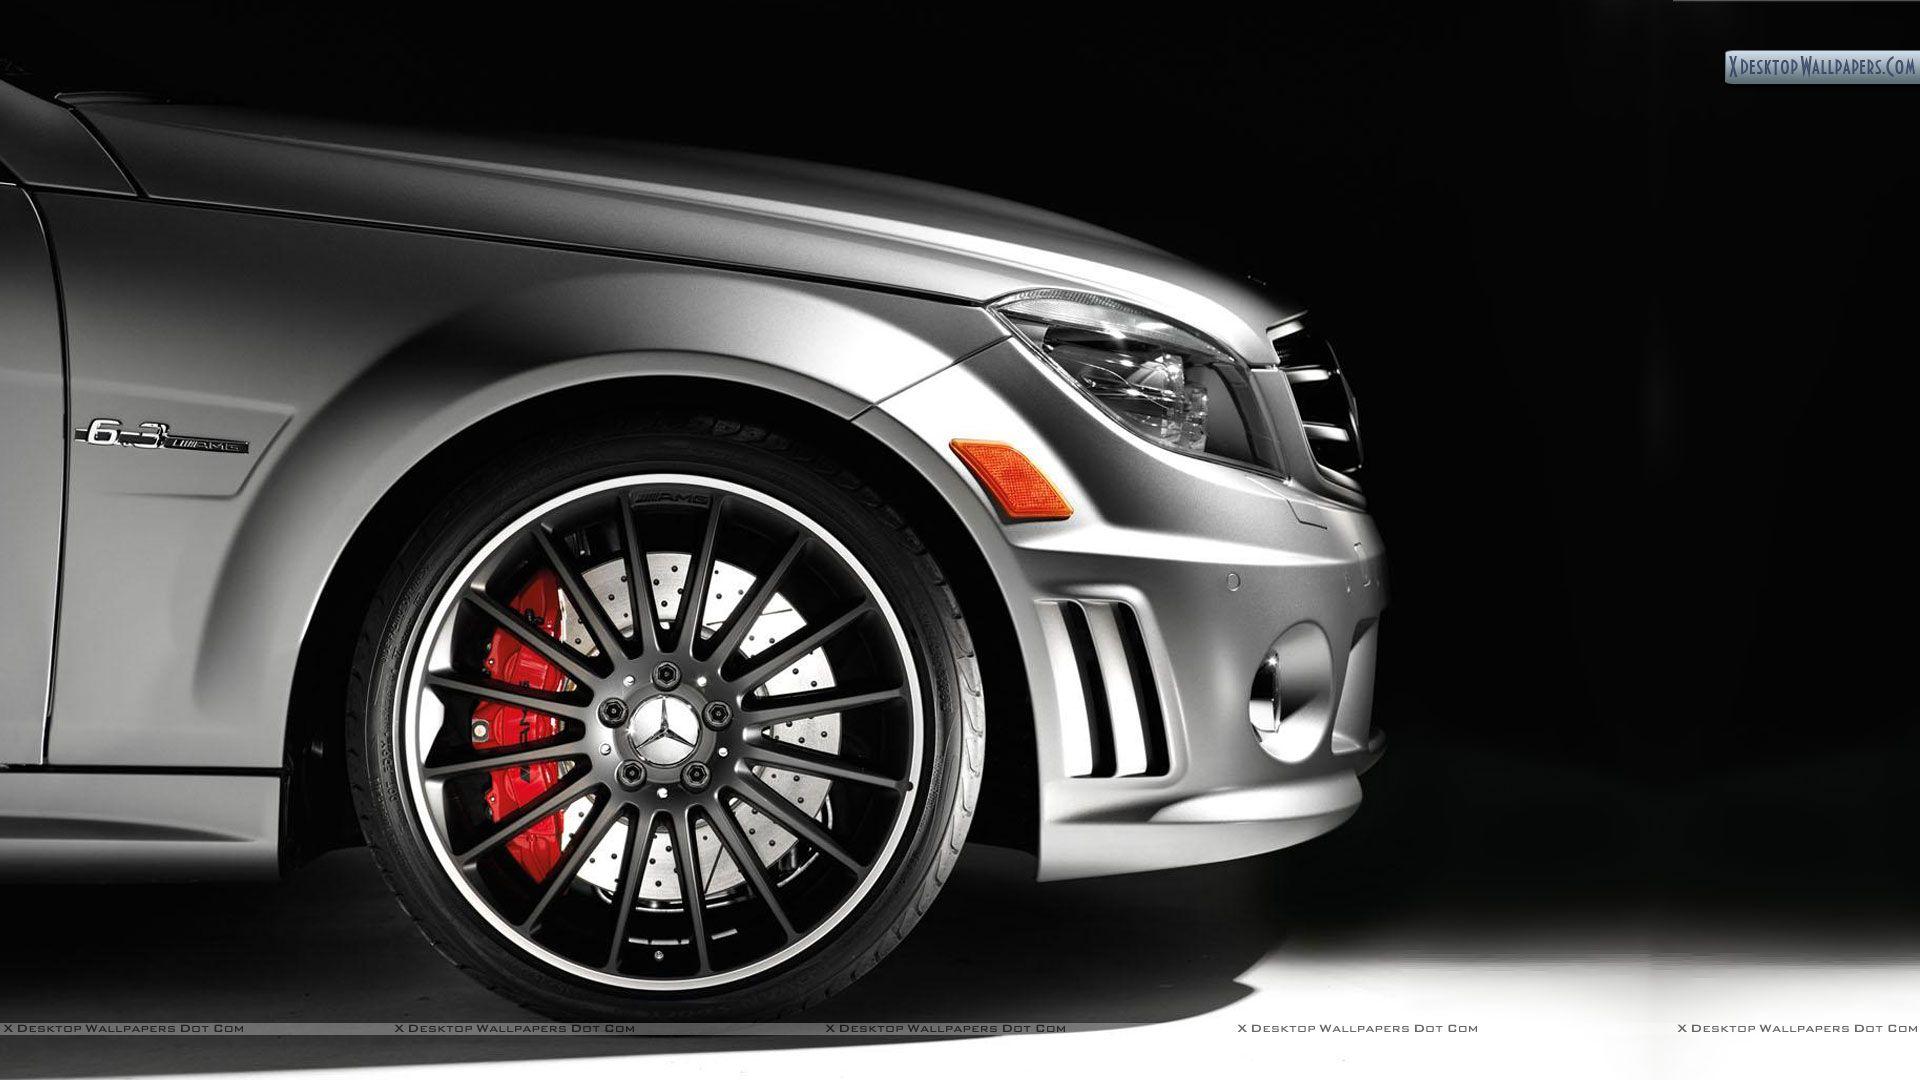 Mercedes tyre photo